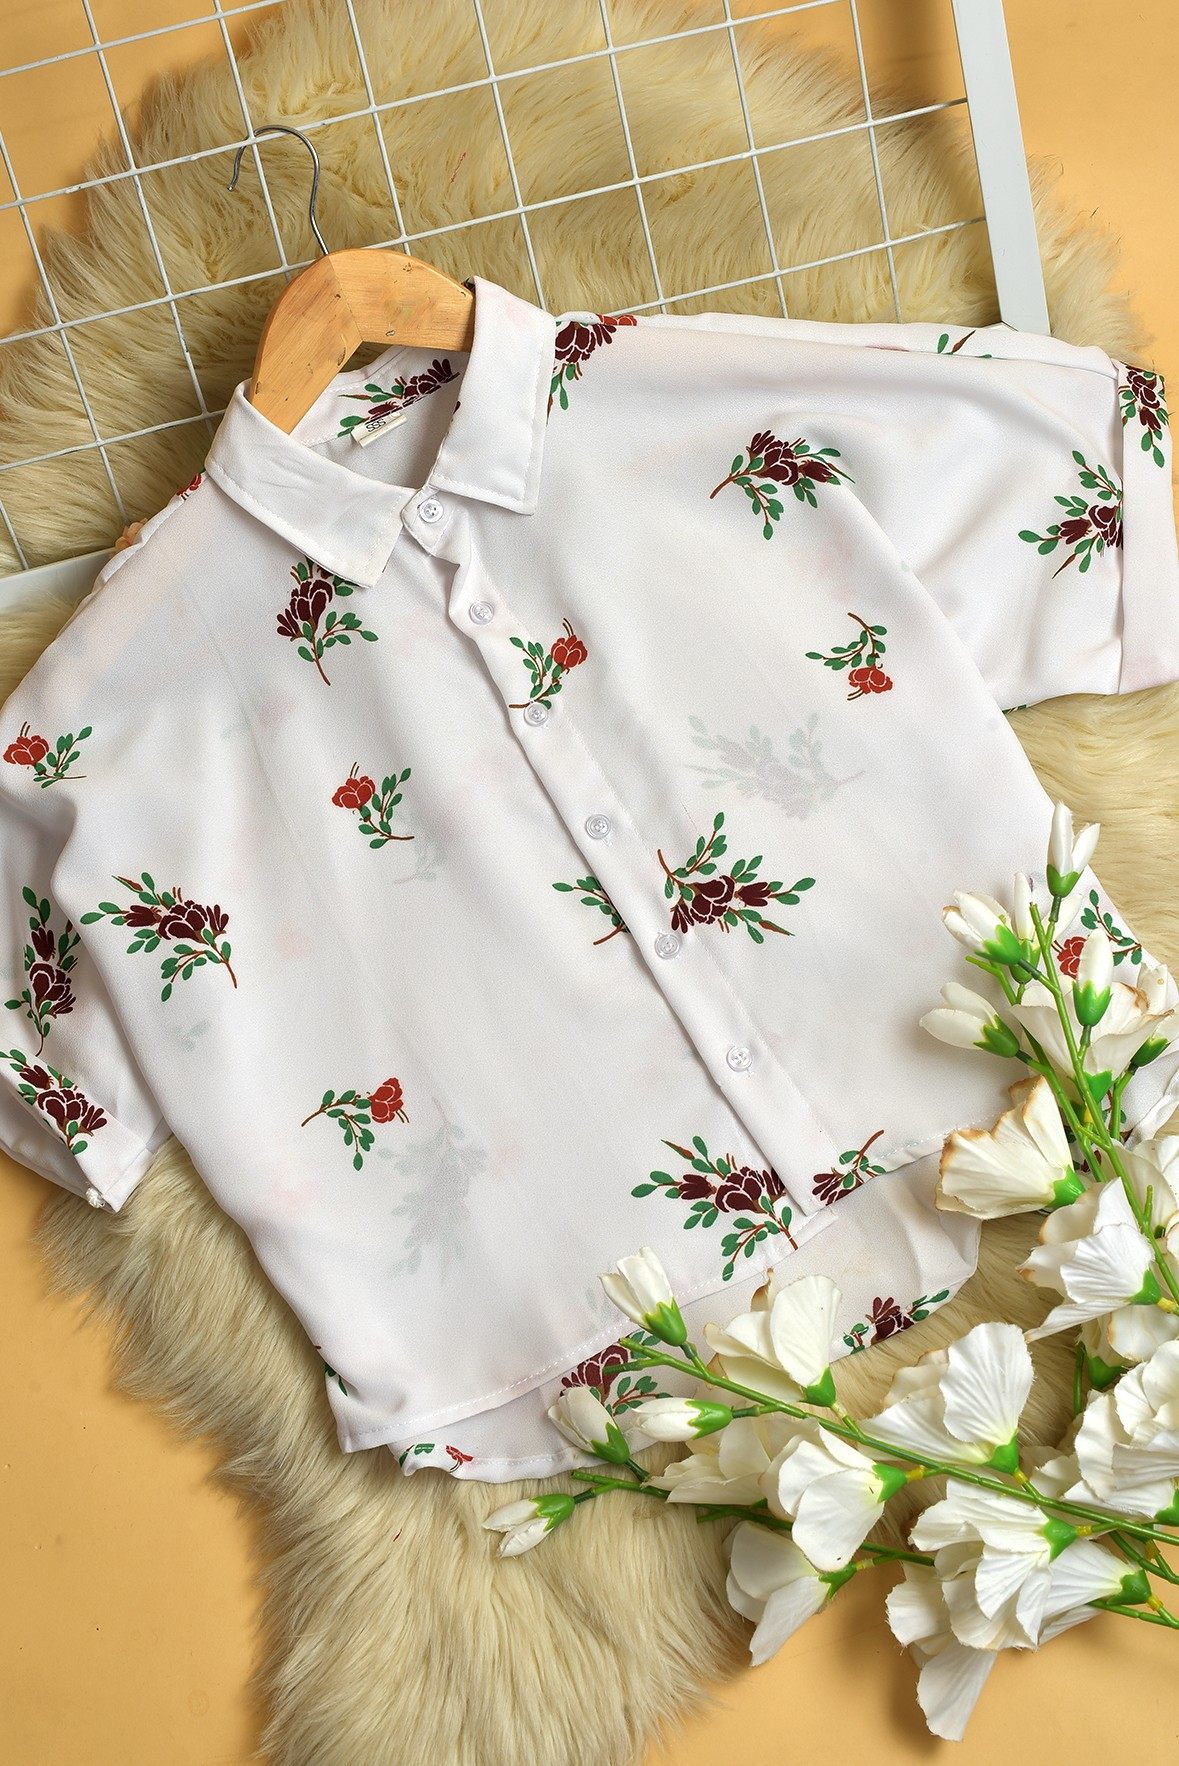 Flower print white shirt